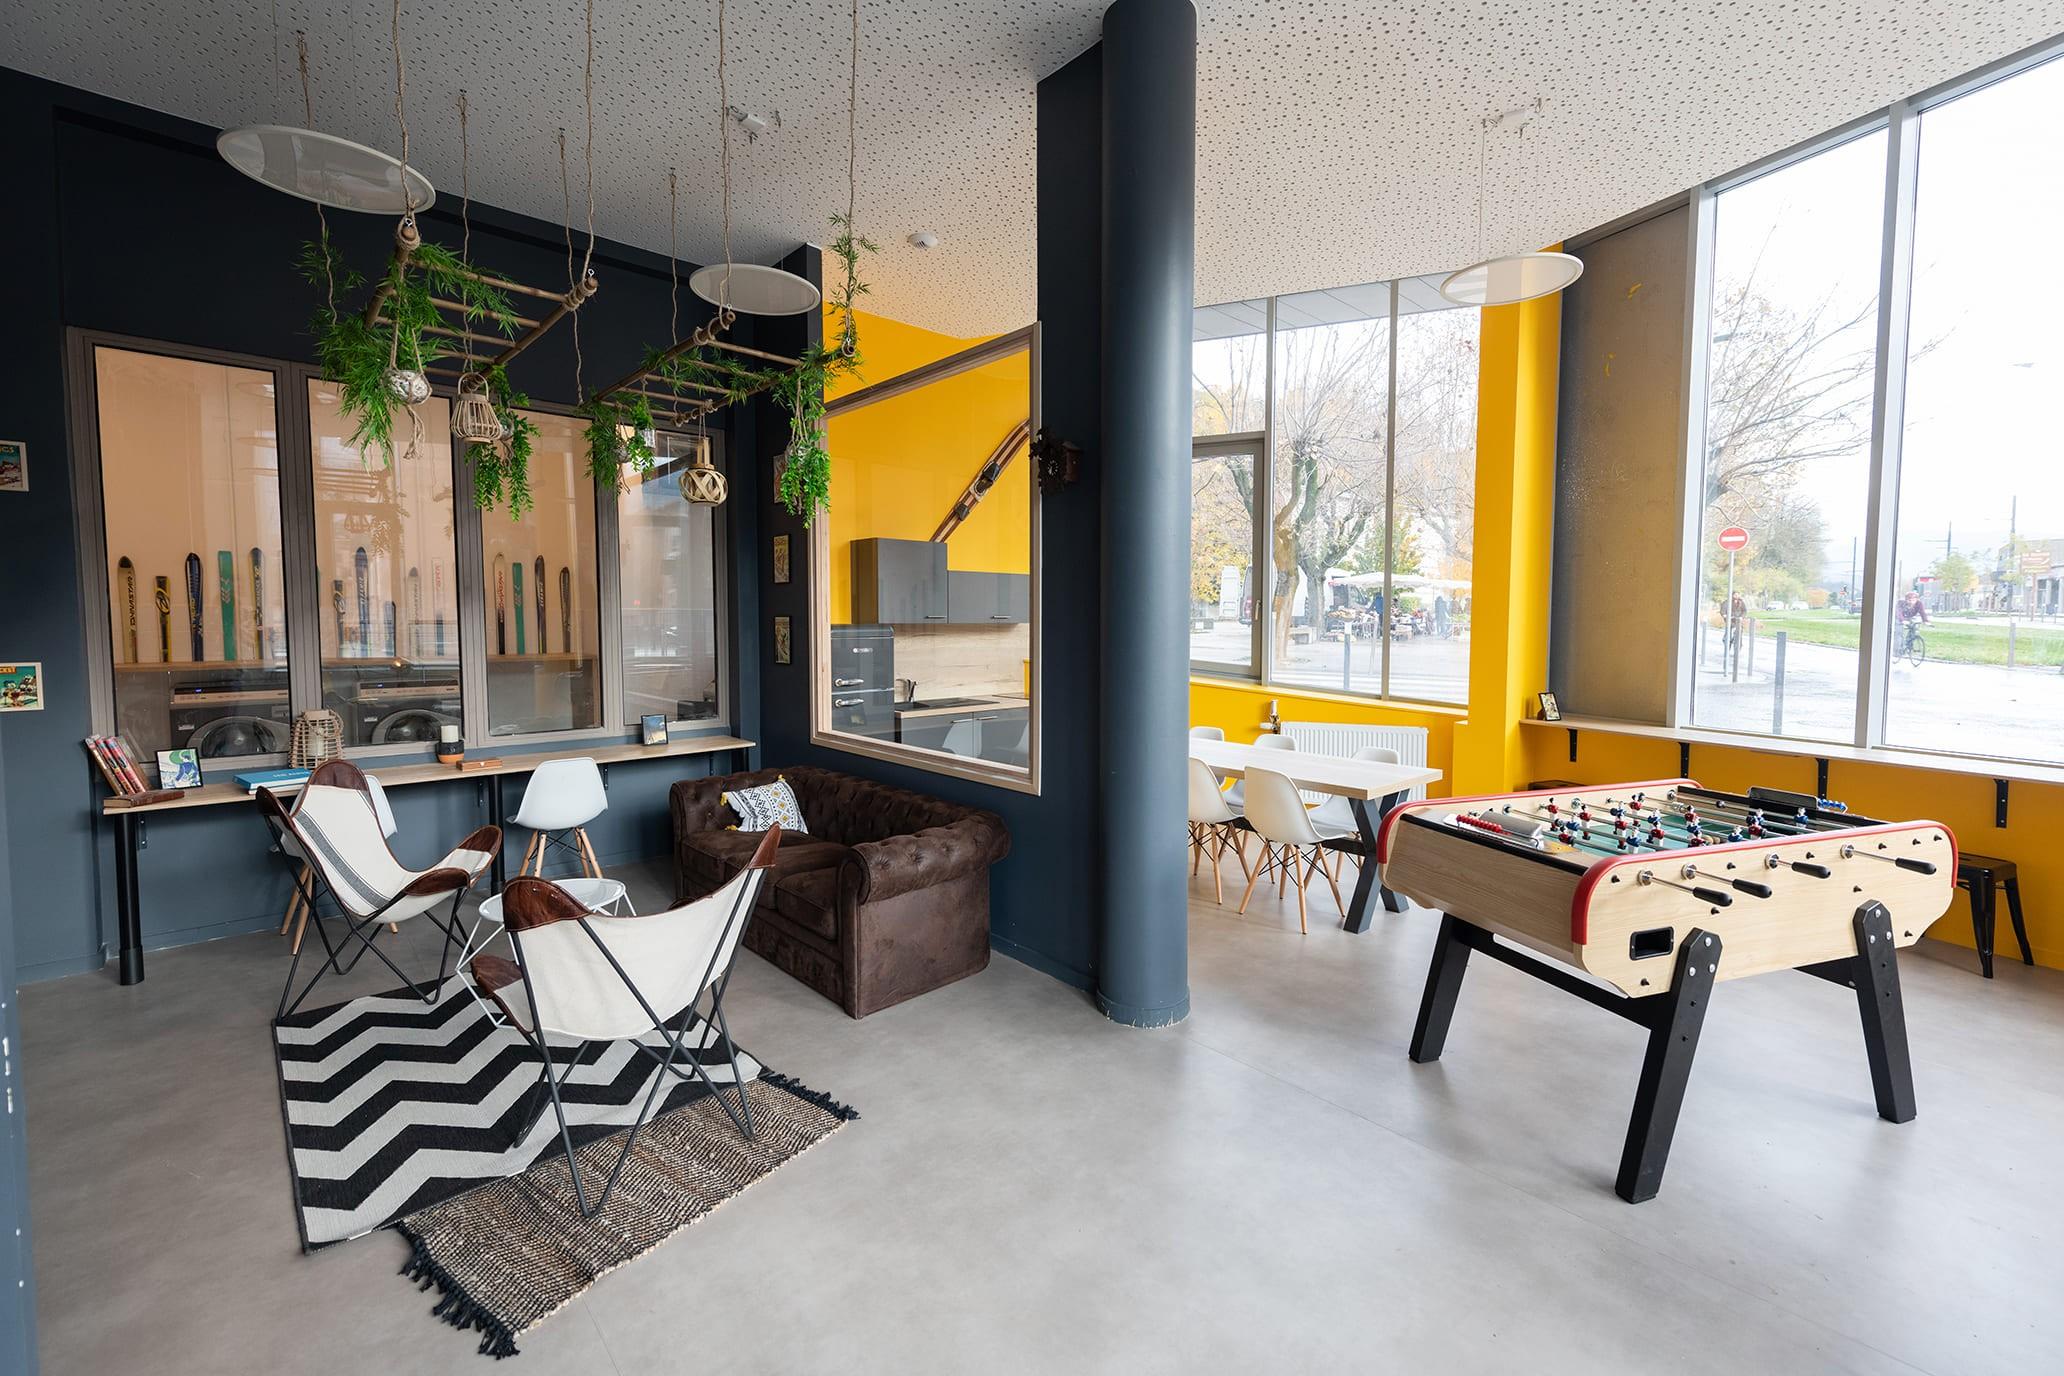 image  2020 07 20 residence etudiante suitetudes time grenoble 2020 salle commune1